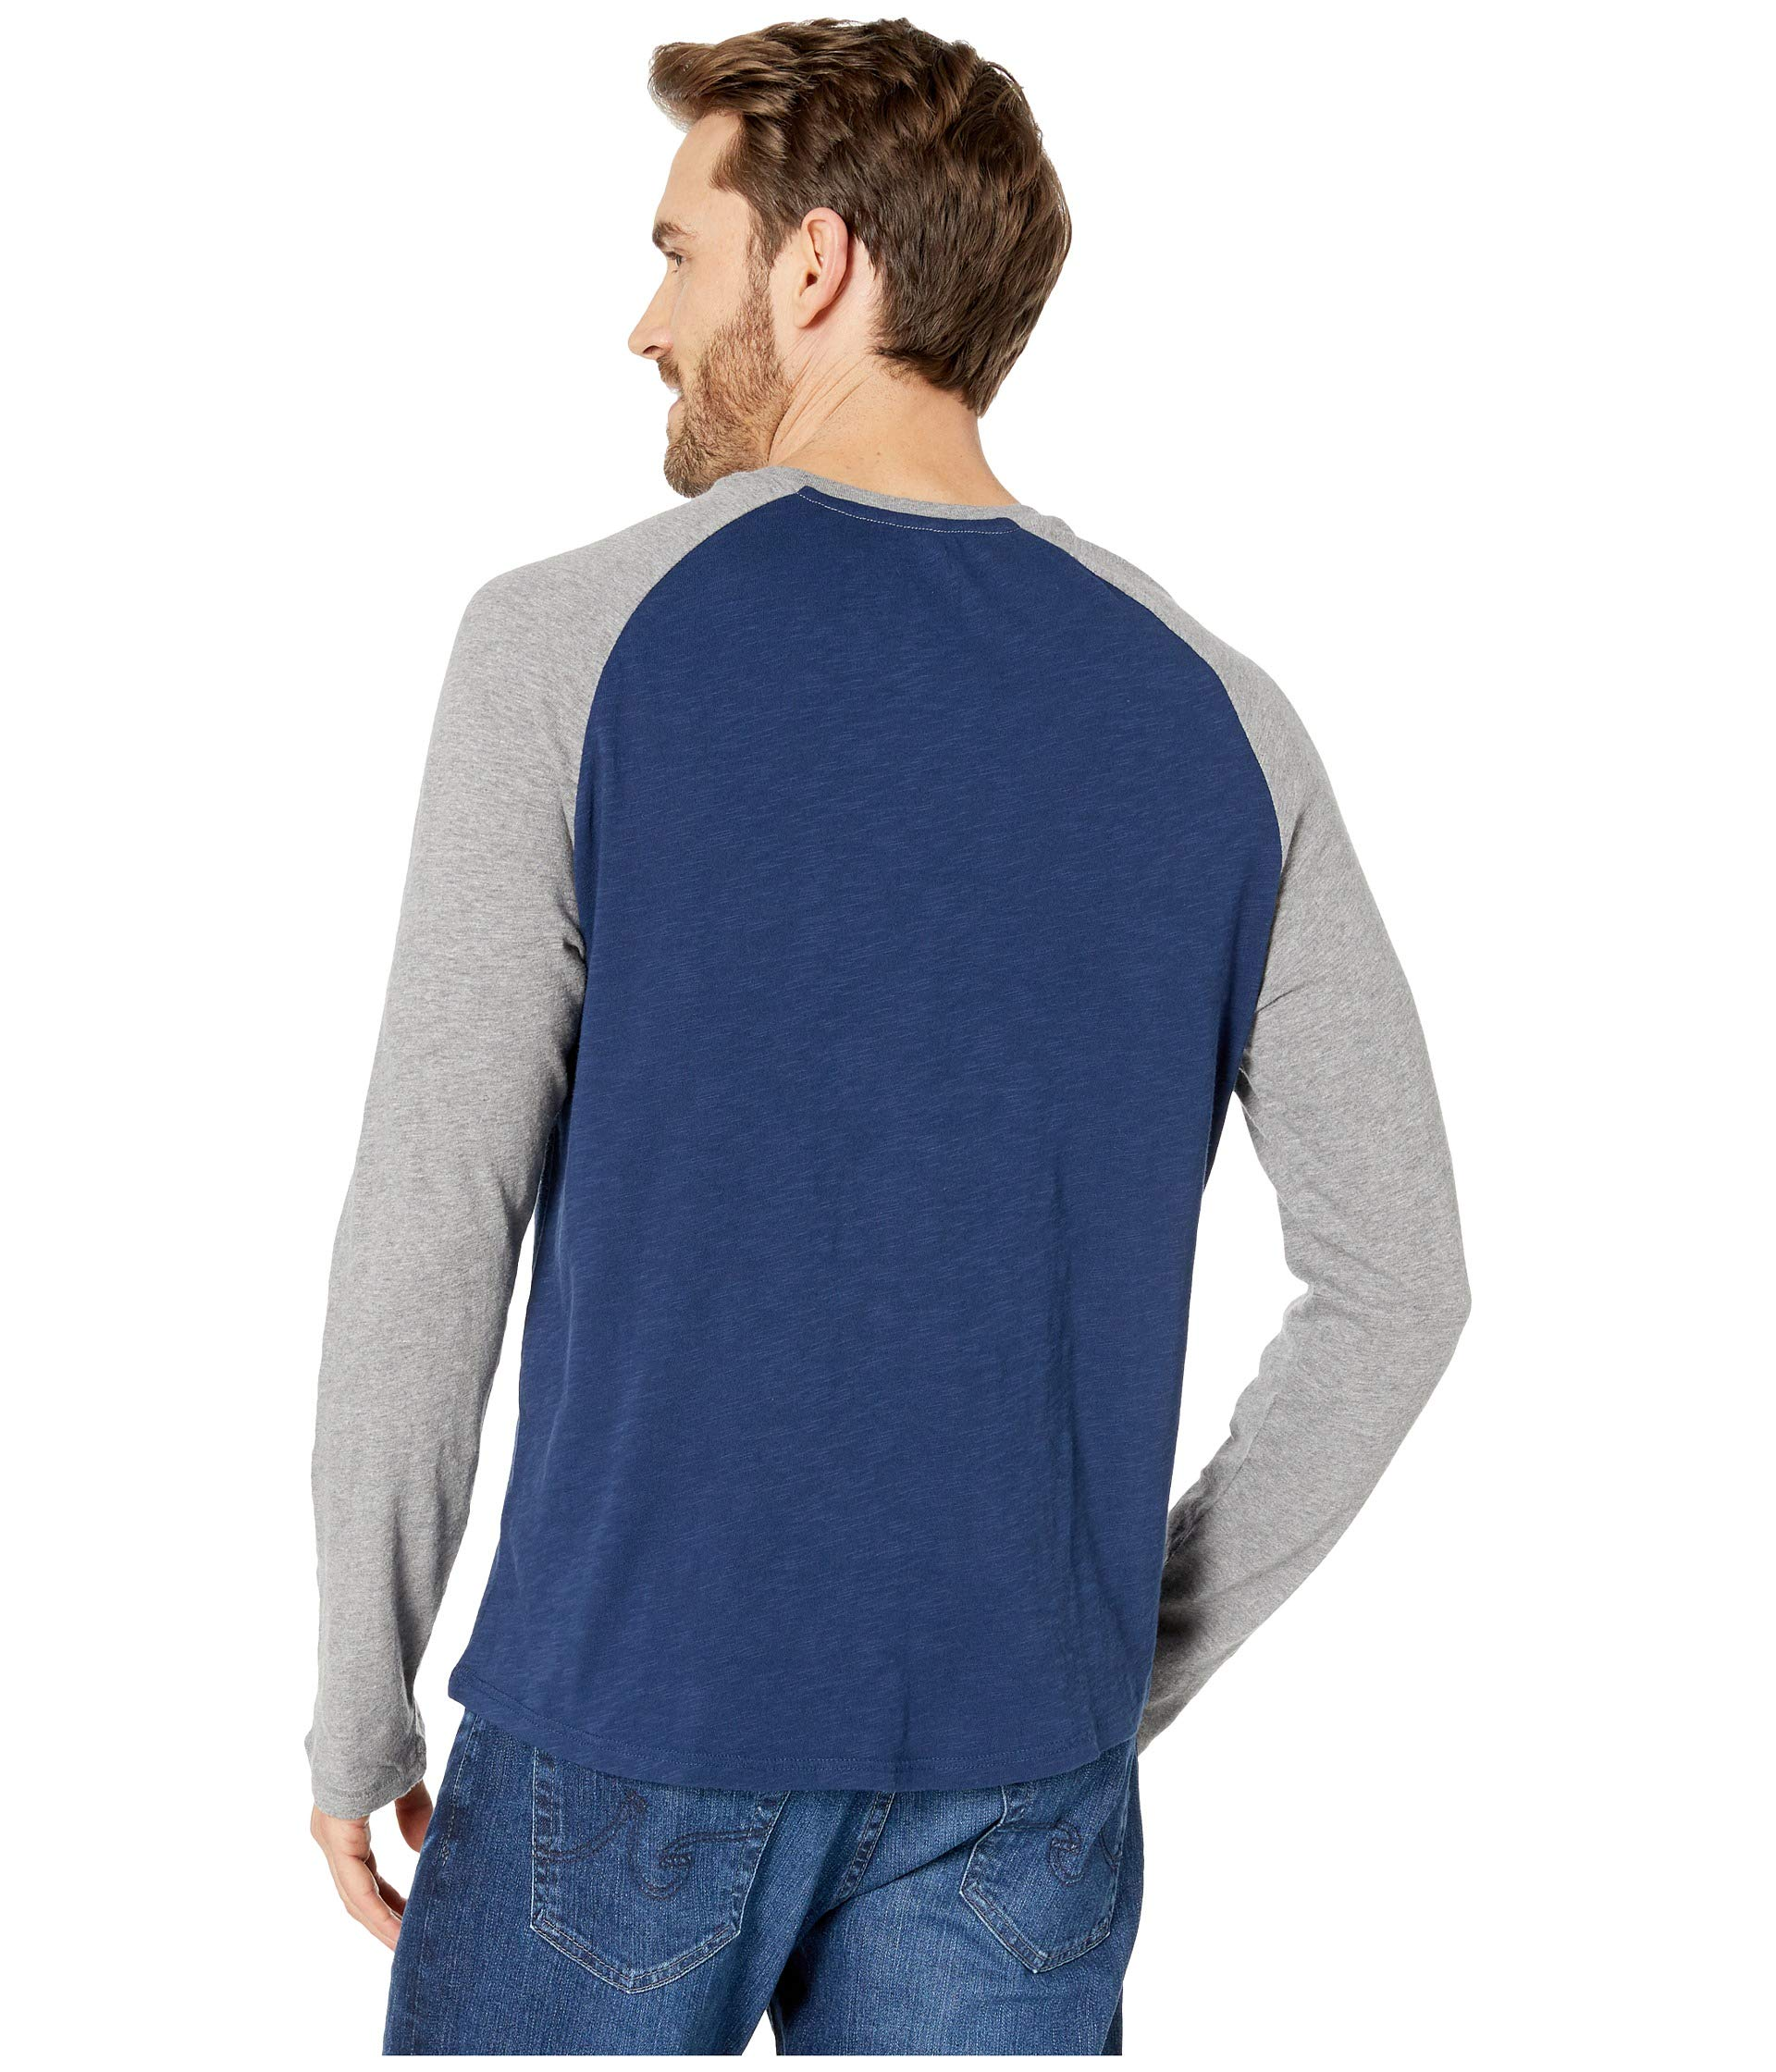 Baseball T shirt Sleeve Life Blue Long Vintage Is Good Darkest gHHqw7